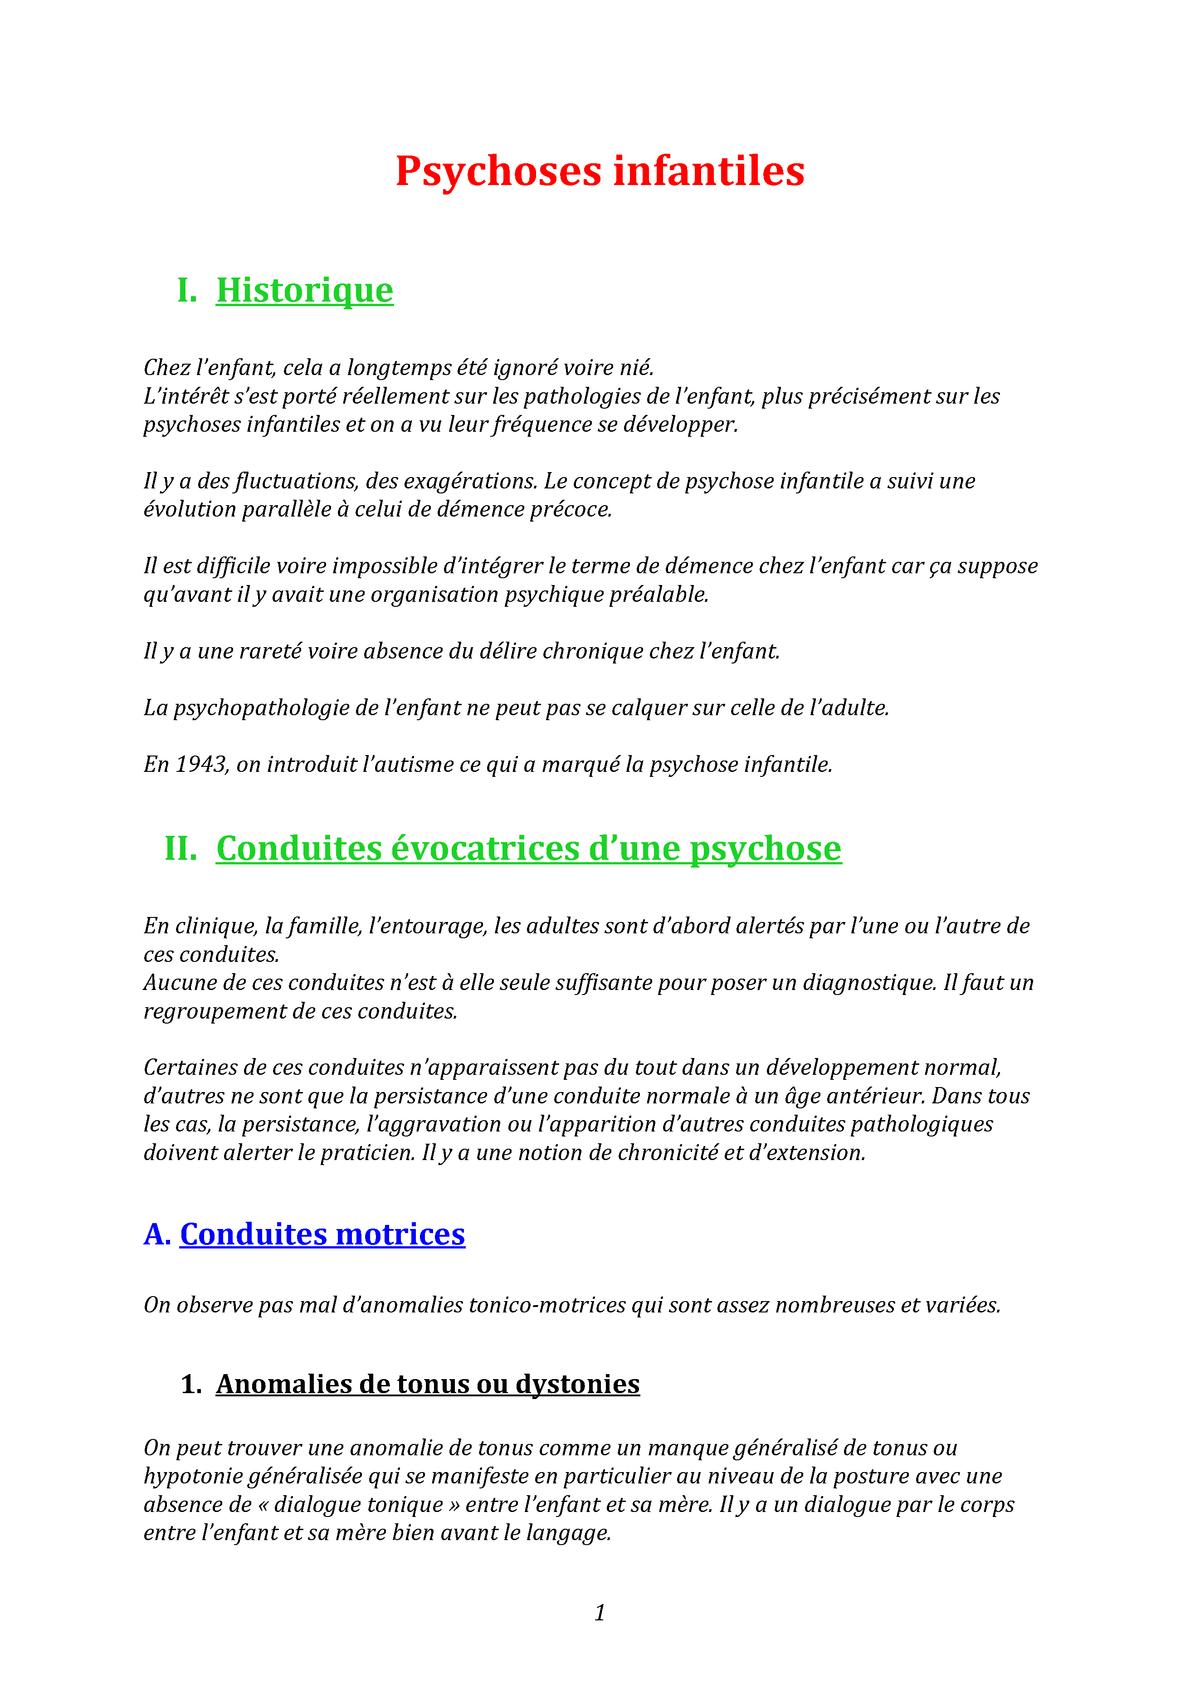 1. Psychoses infantiles - Leroy - Psychopathologie 2 - StuDocu